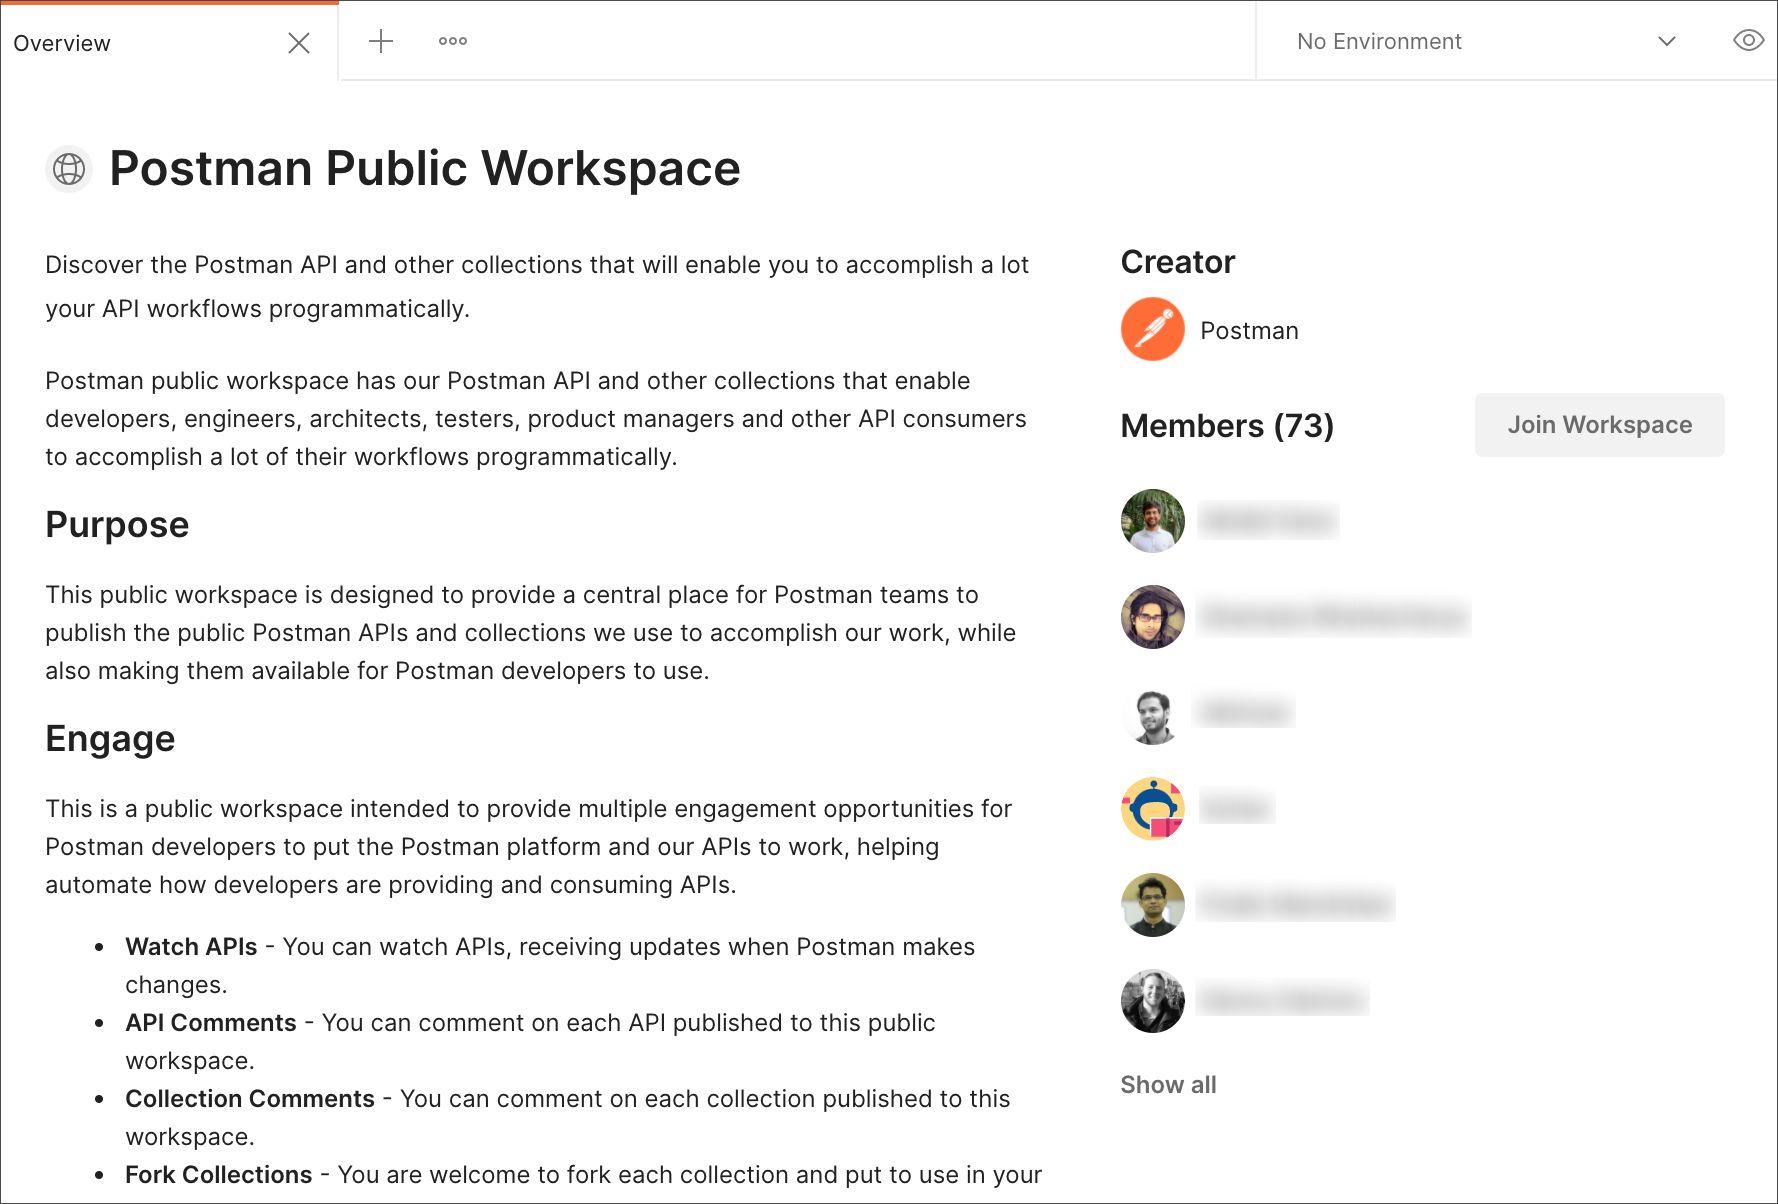 Join public workspace